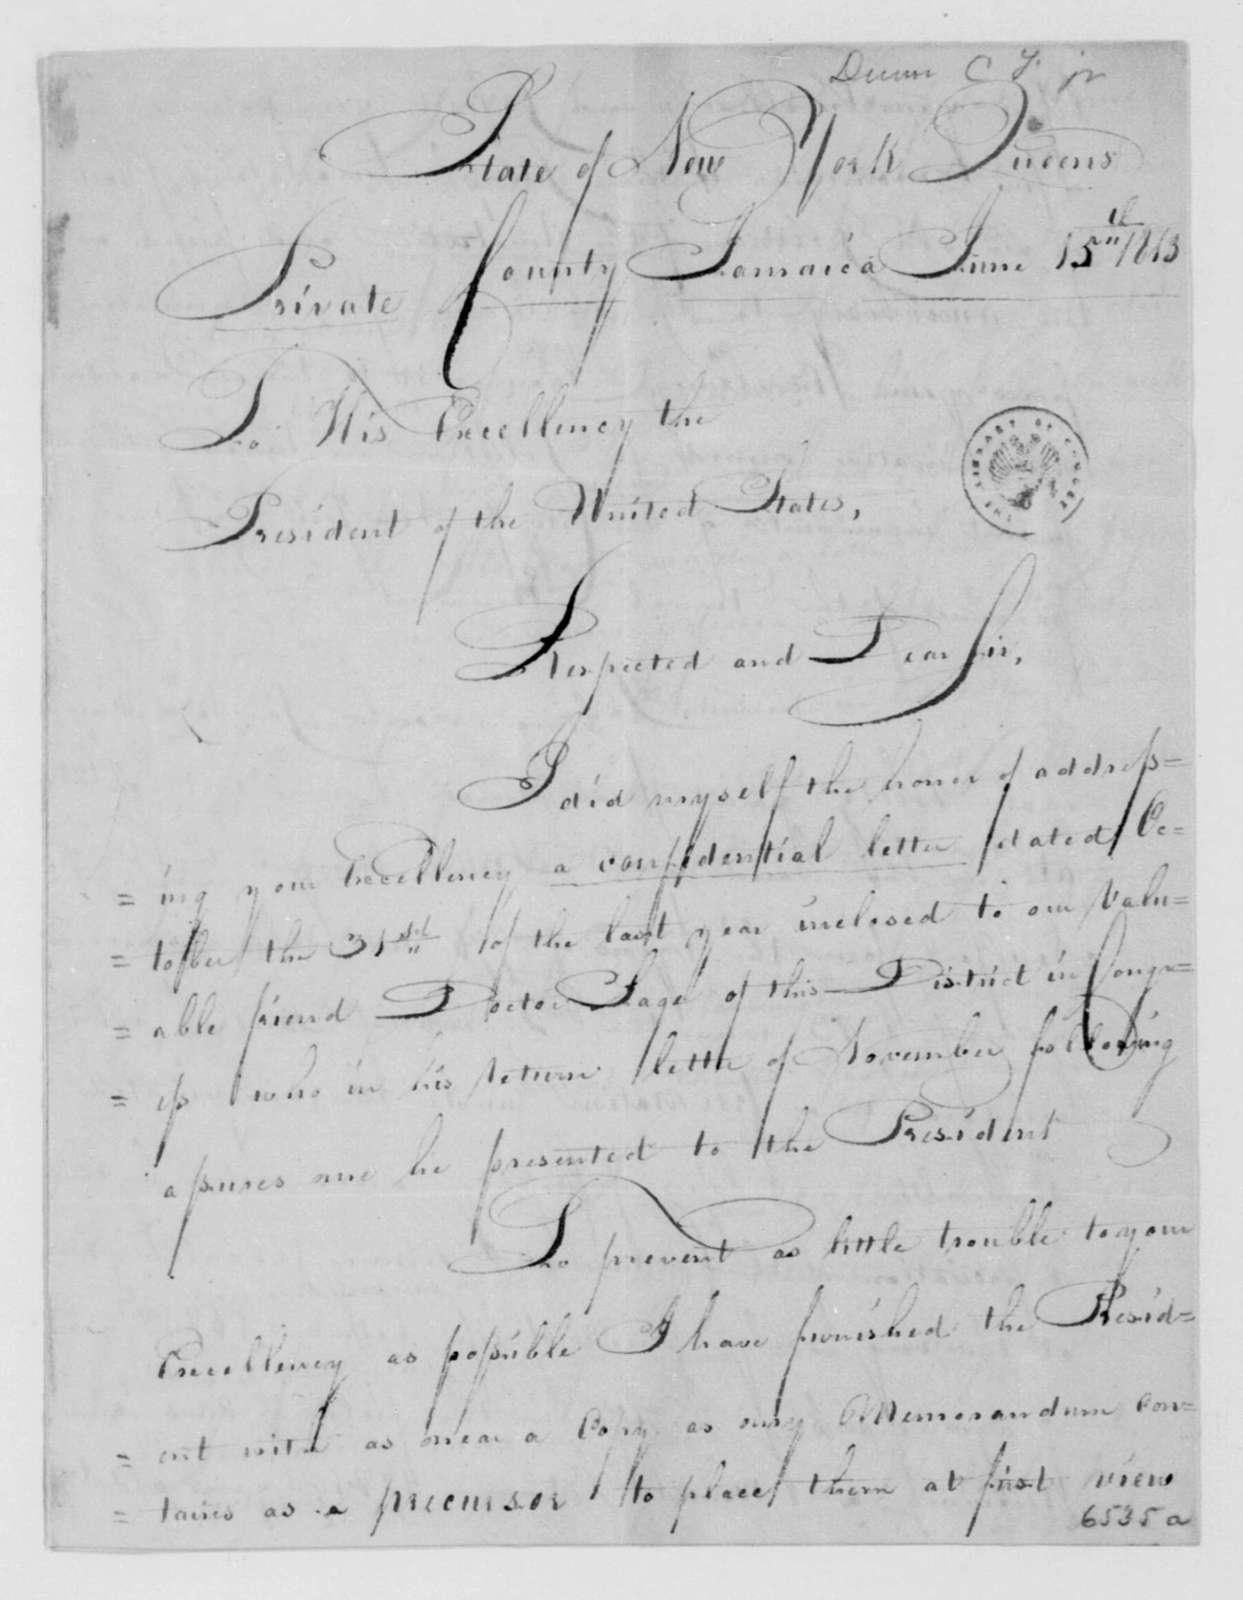 C. Dunn to James Madison, June 15, 1813.